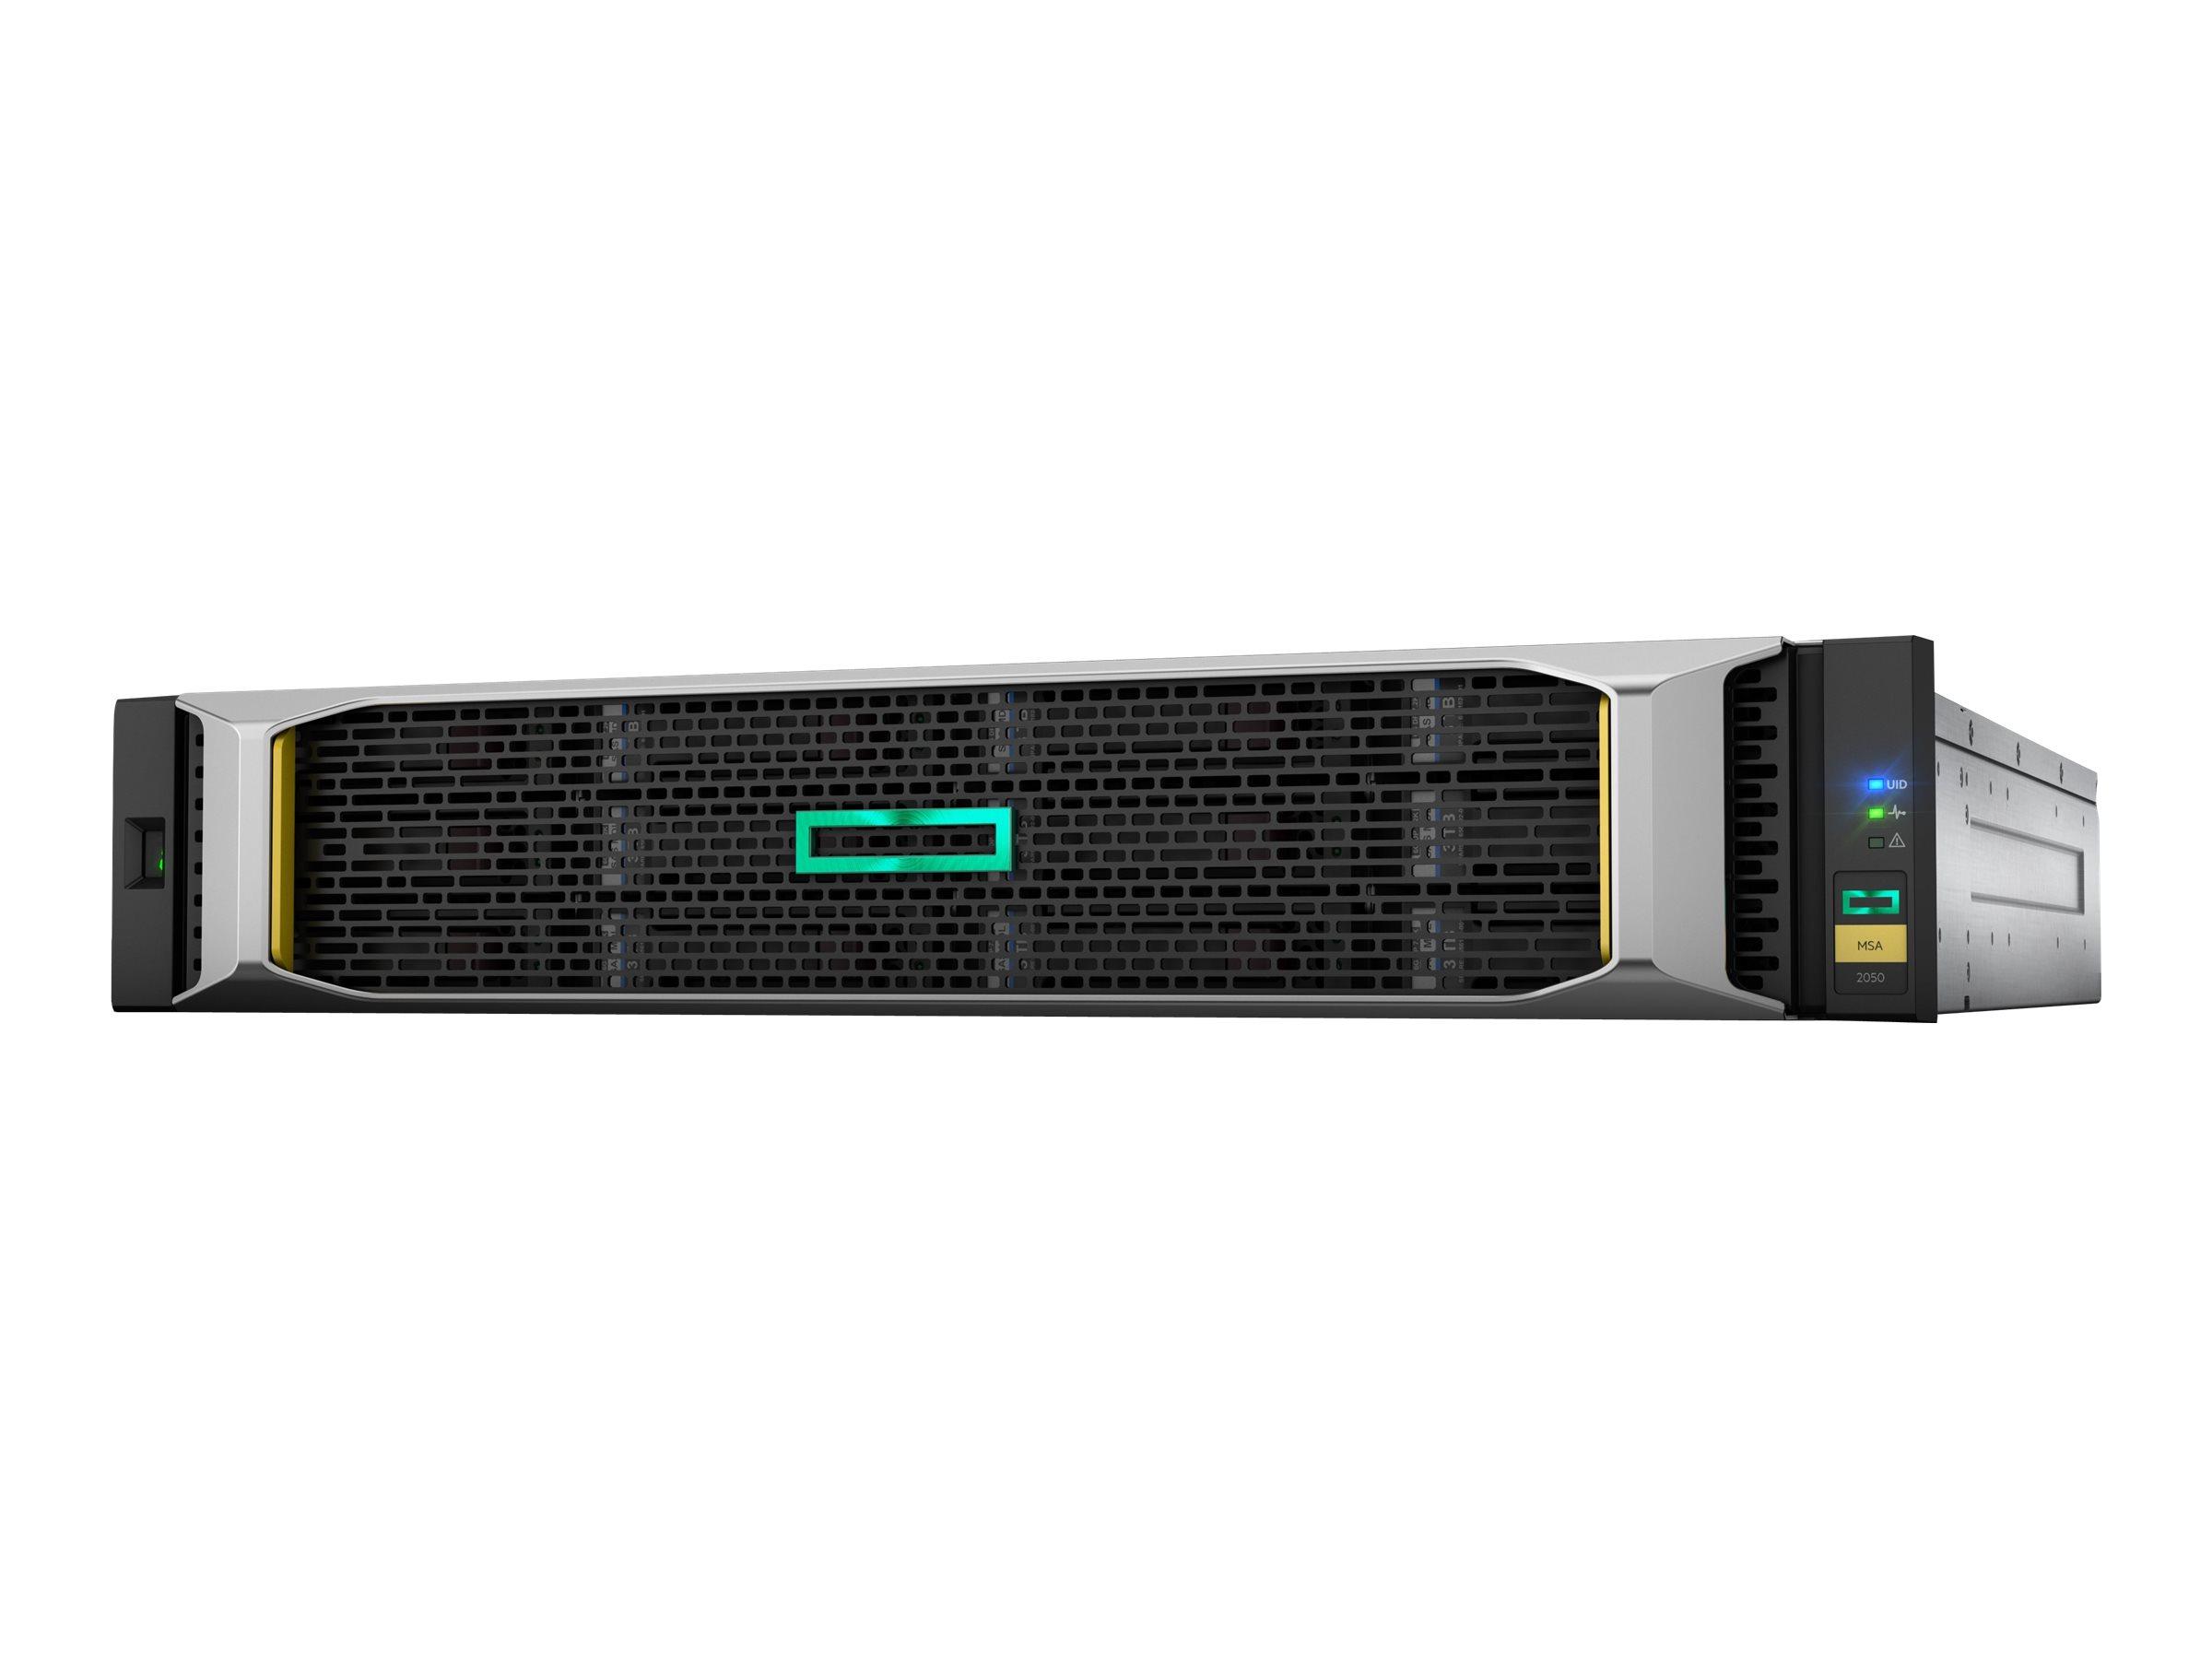 HPE Modular Smart Array 2050 SAN Dual Controller LFF Storage - Festplatten-Array - 12 Schächte (SAS-3) - SAS 12Gb/s (extern) - R